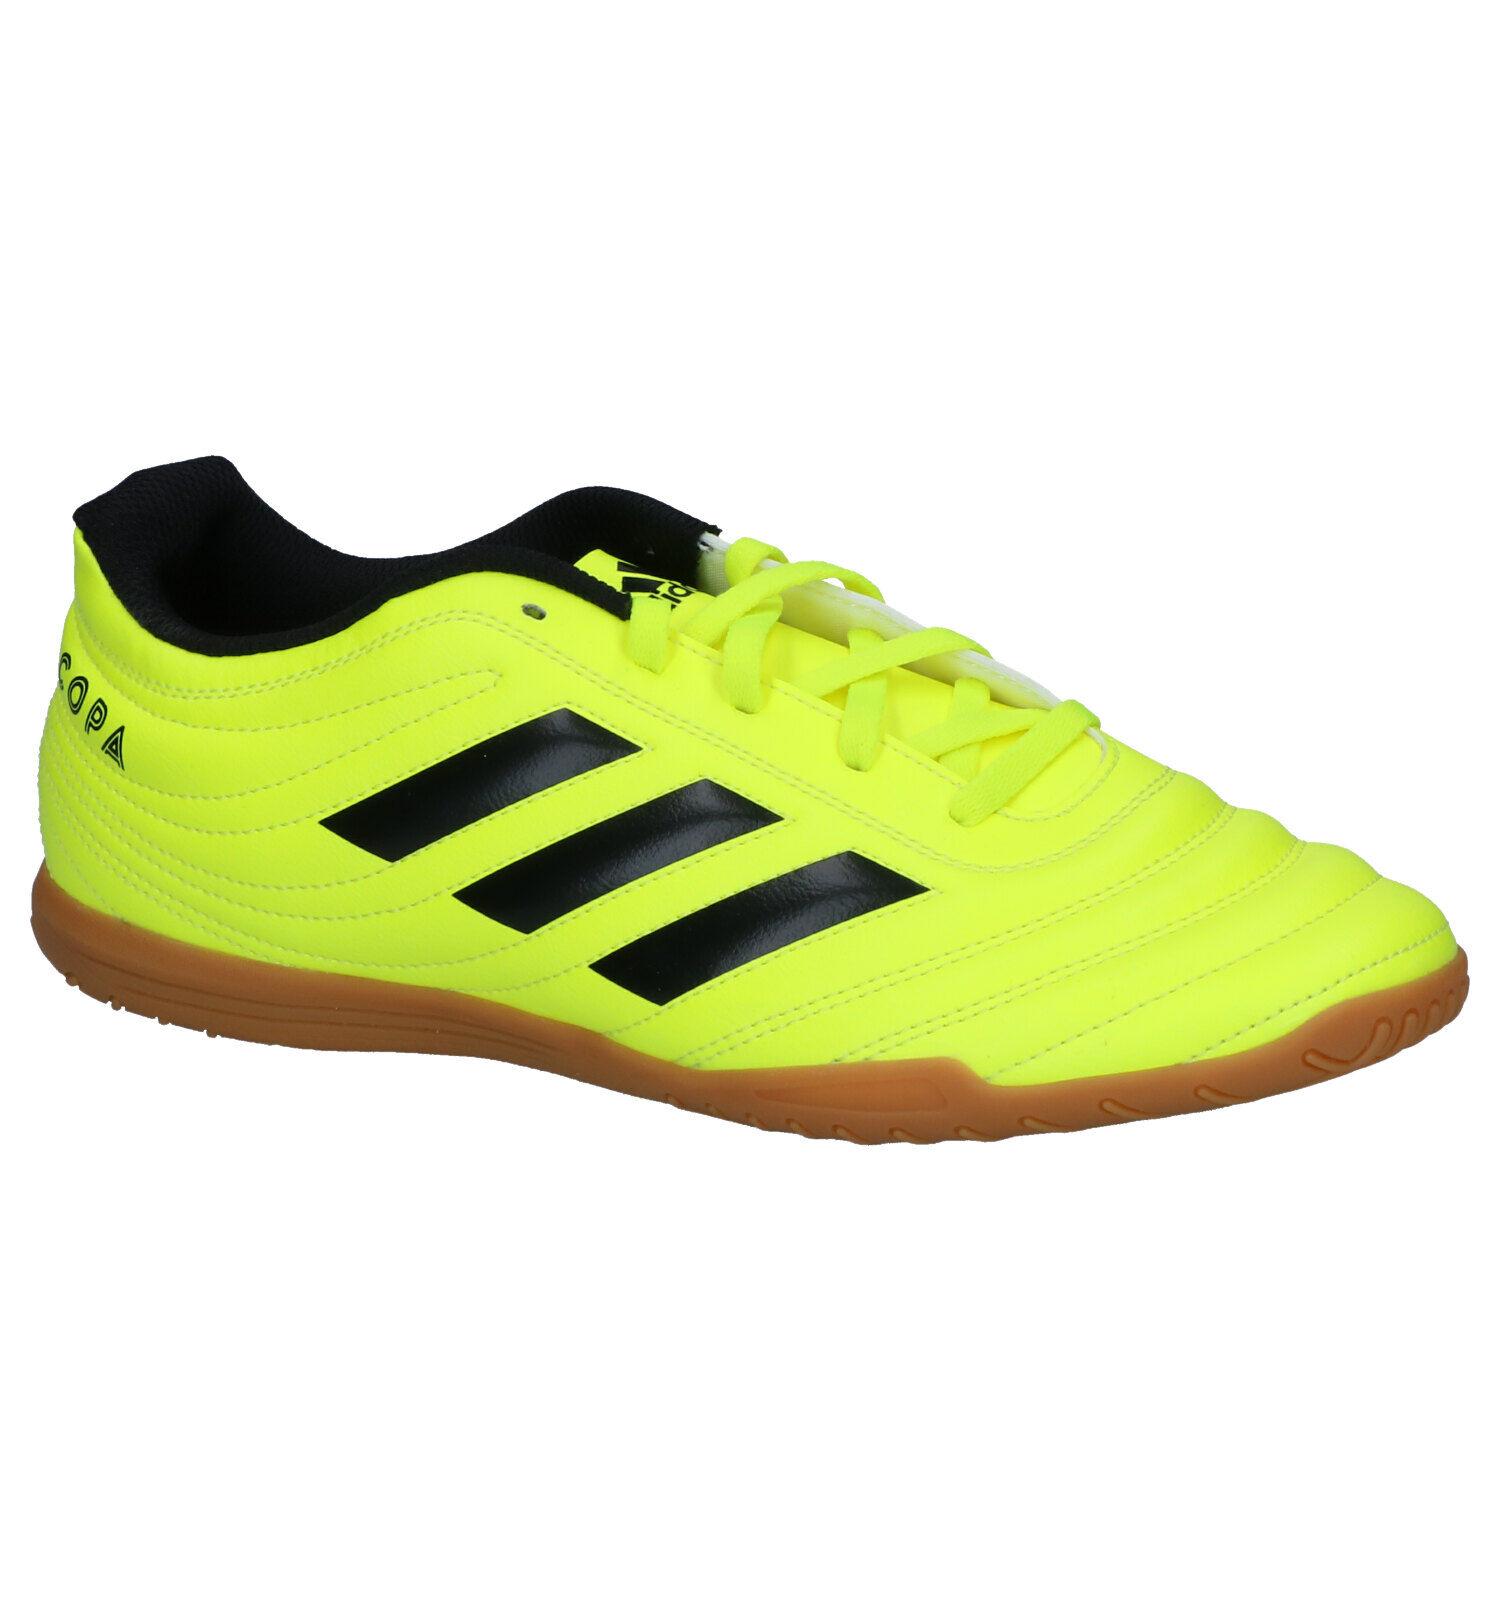 adidas chaussure imitation foot